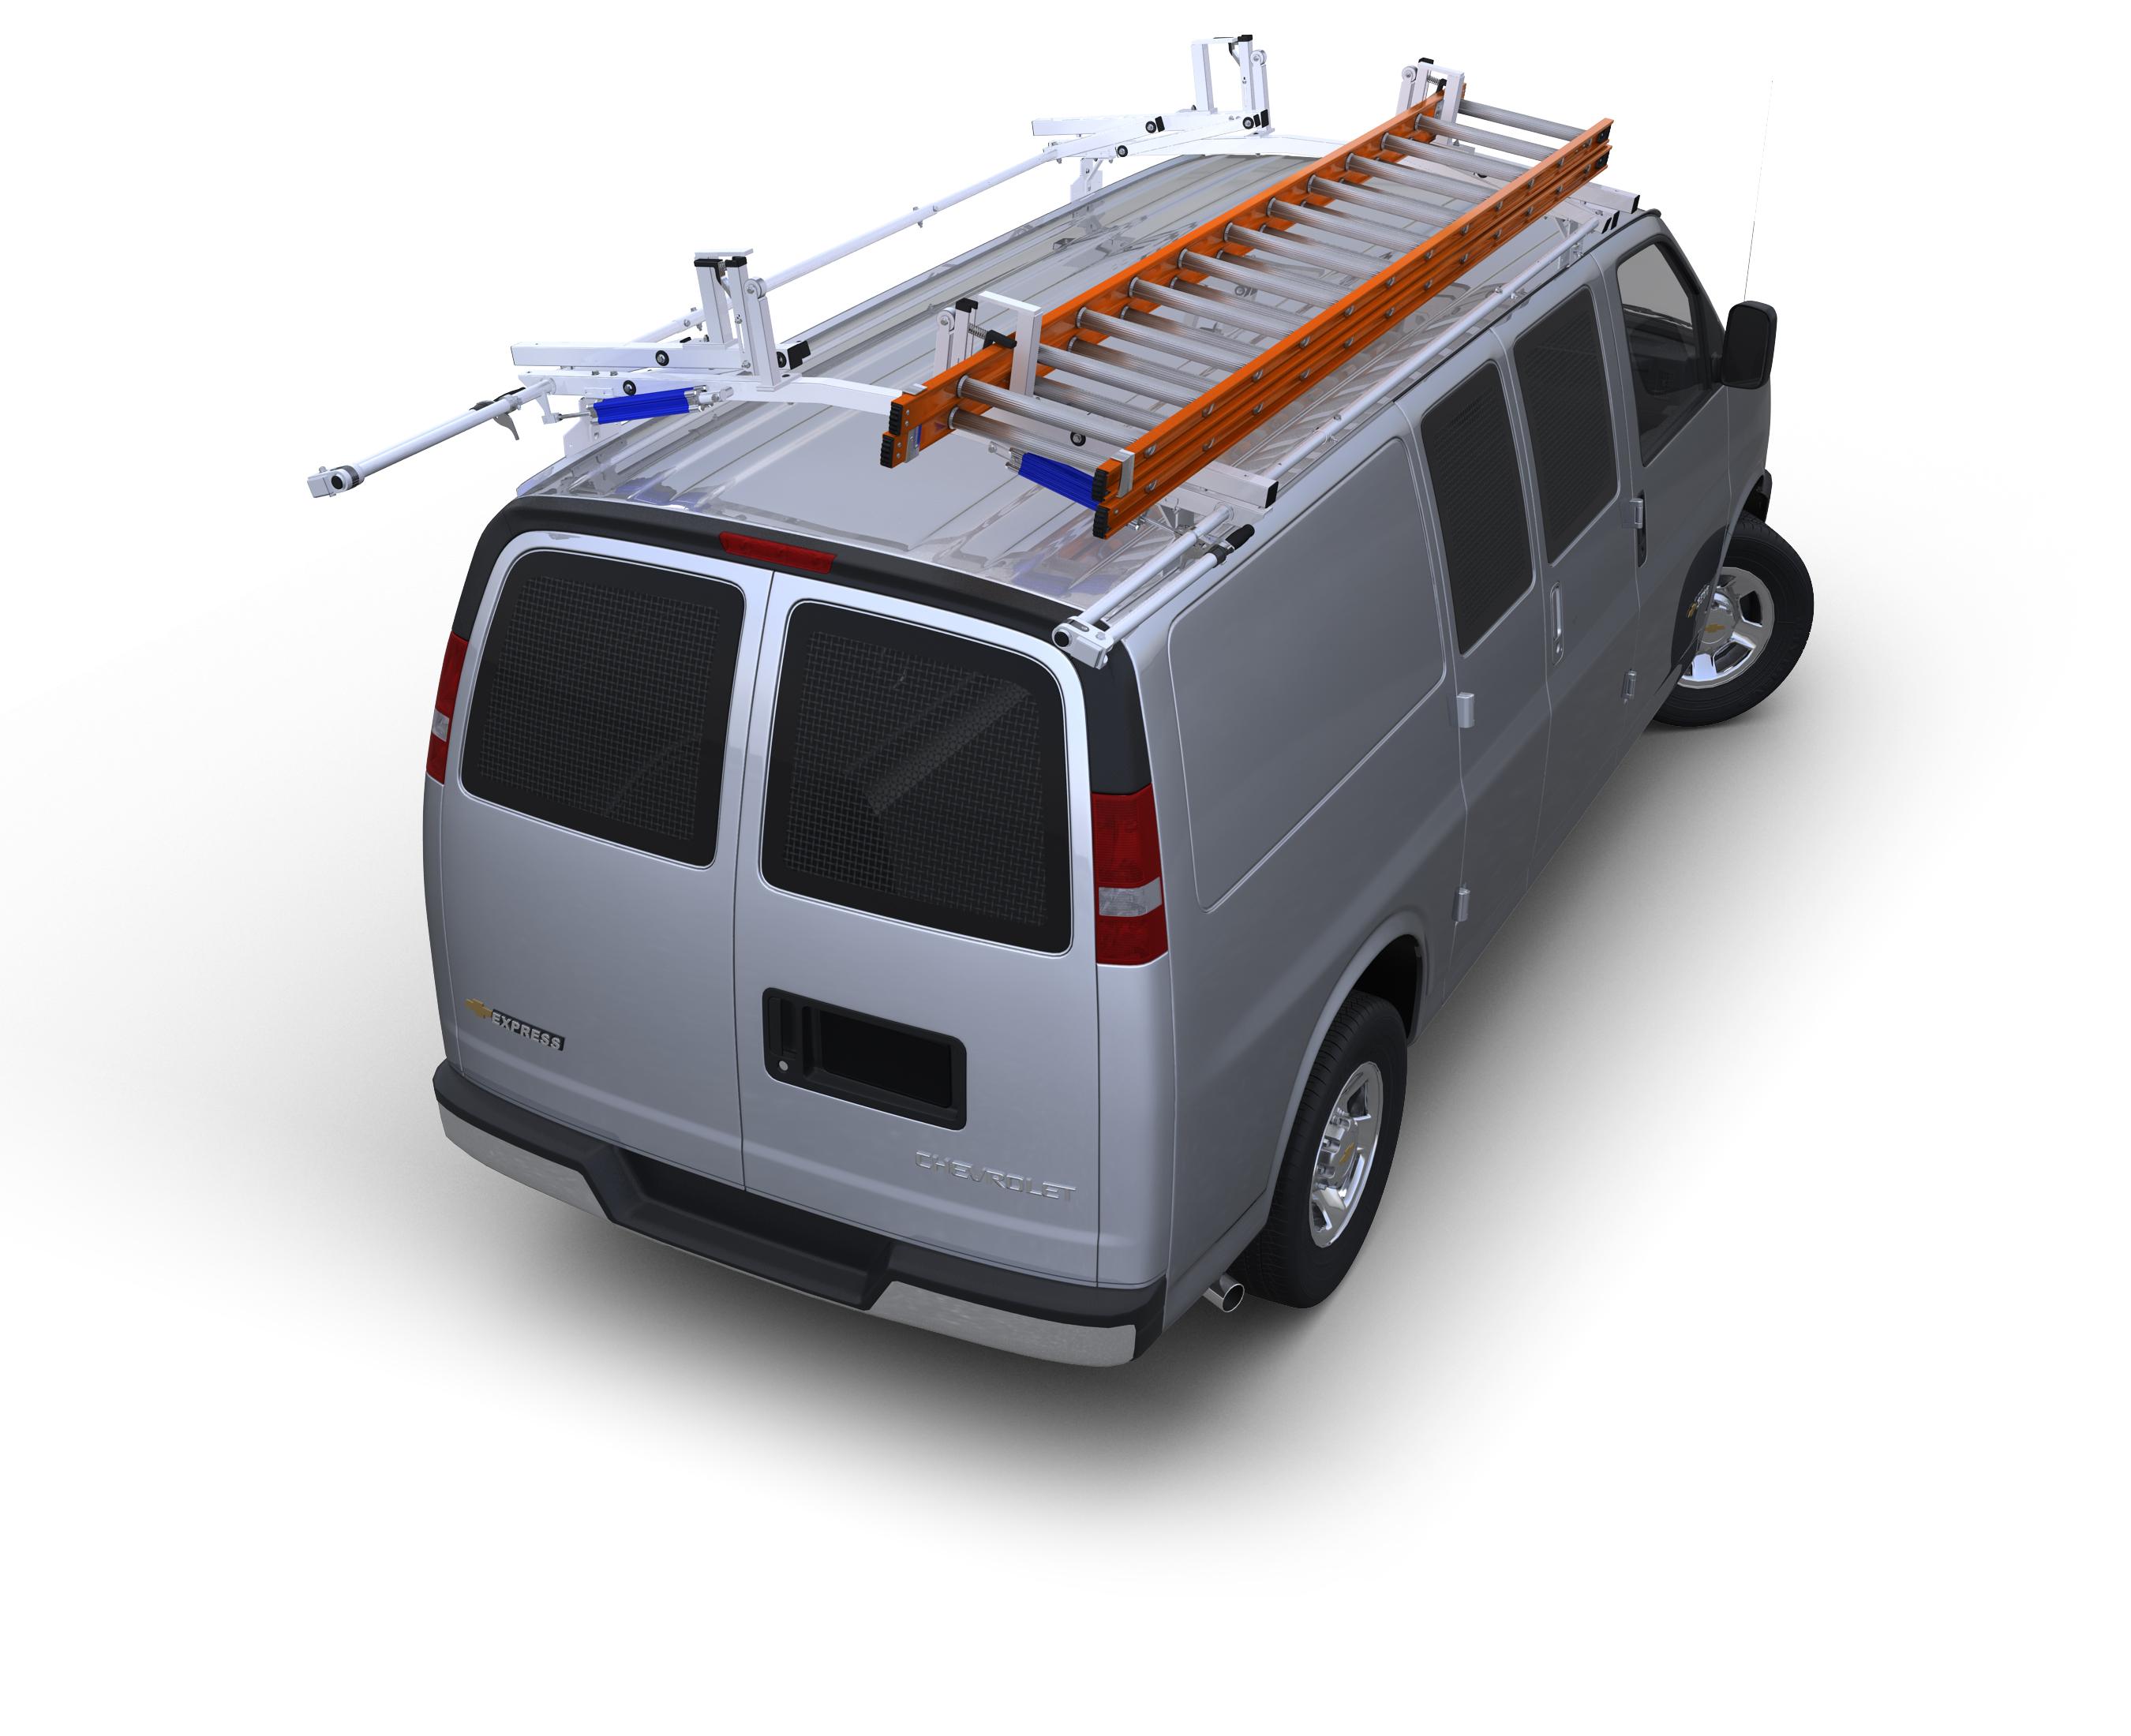 "MB Sprinter 144""WB Std. Roof Plumbing Van Package, Aluminum Shelving - SAVE $175!"